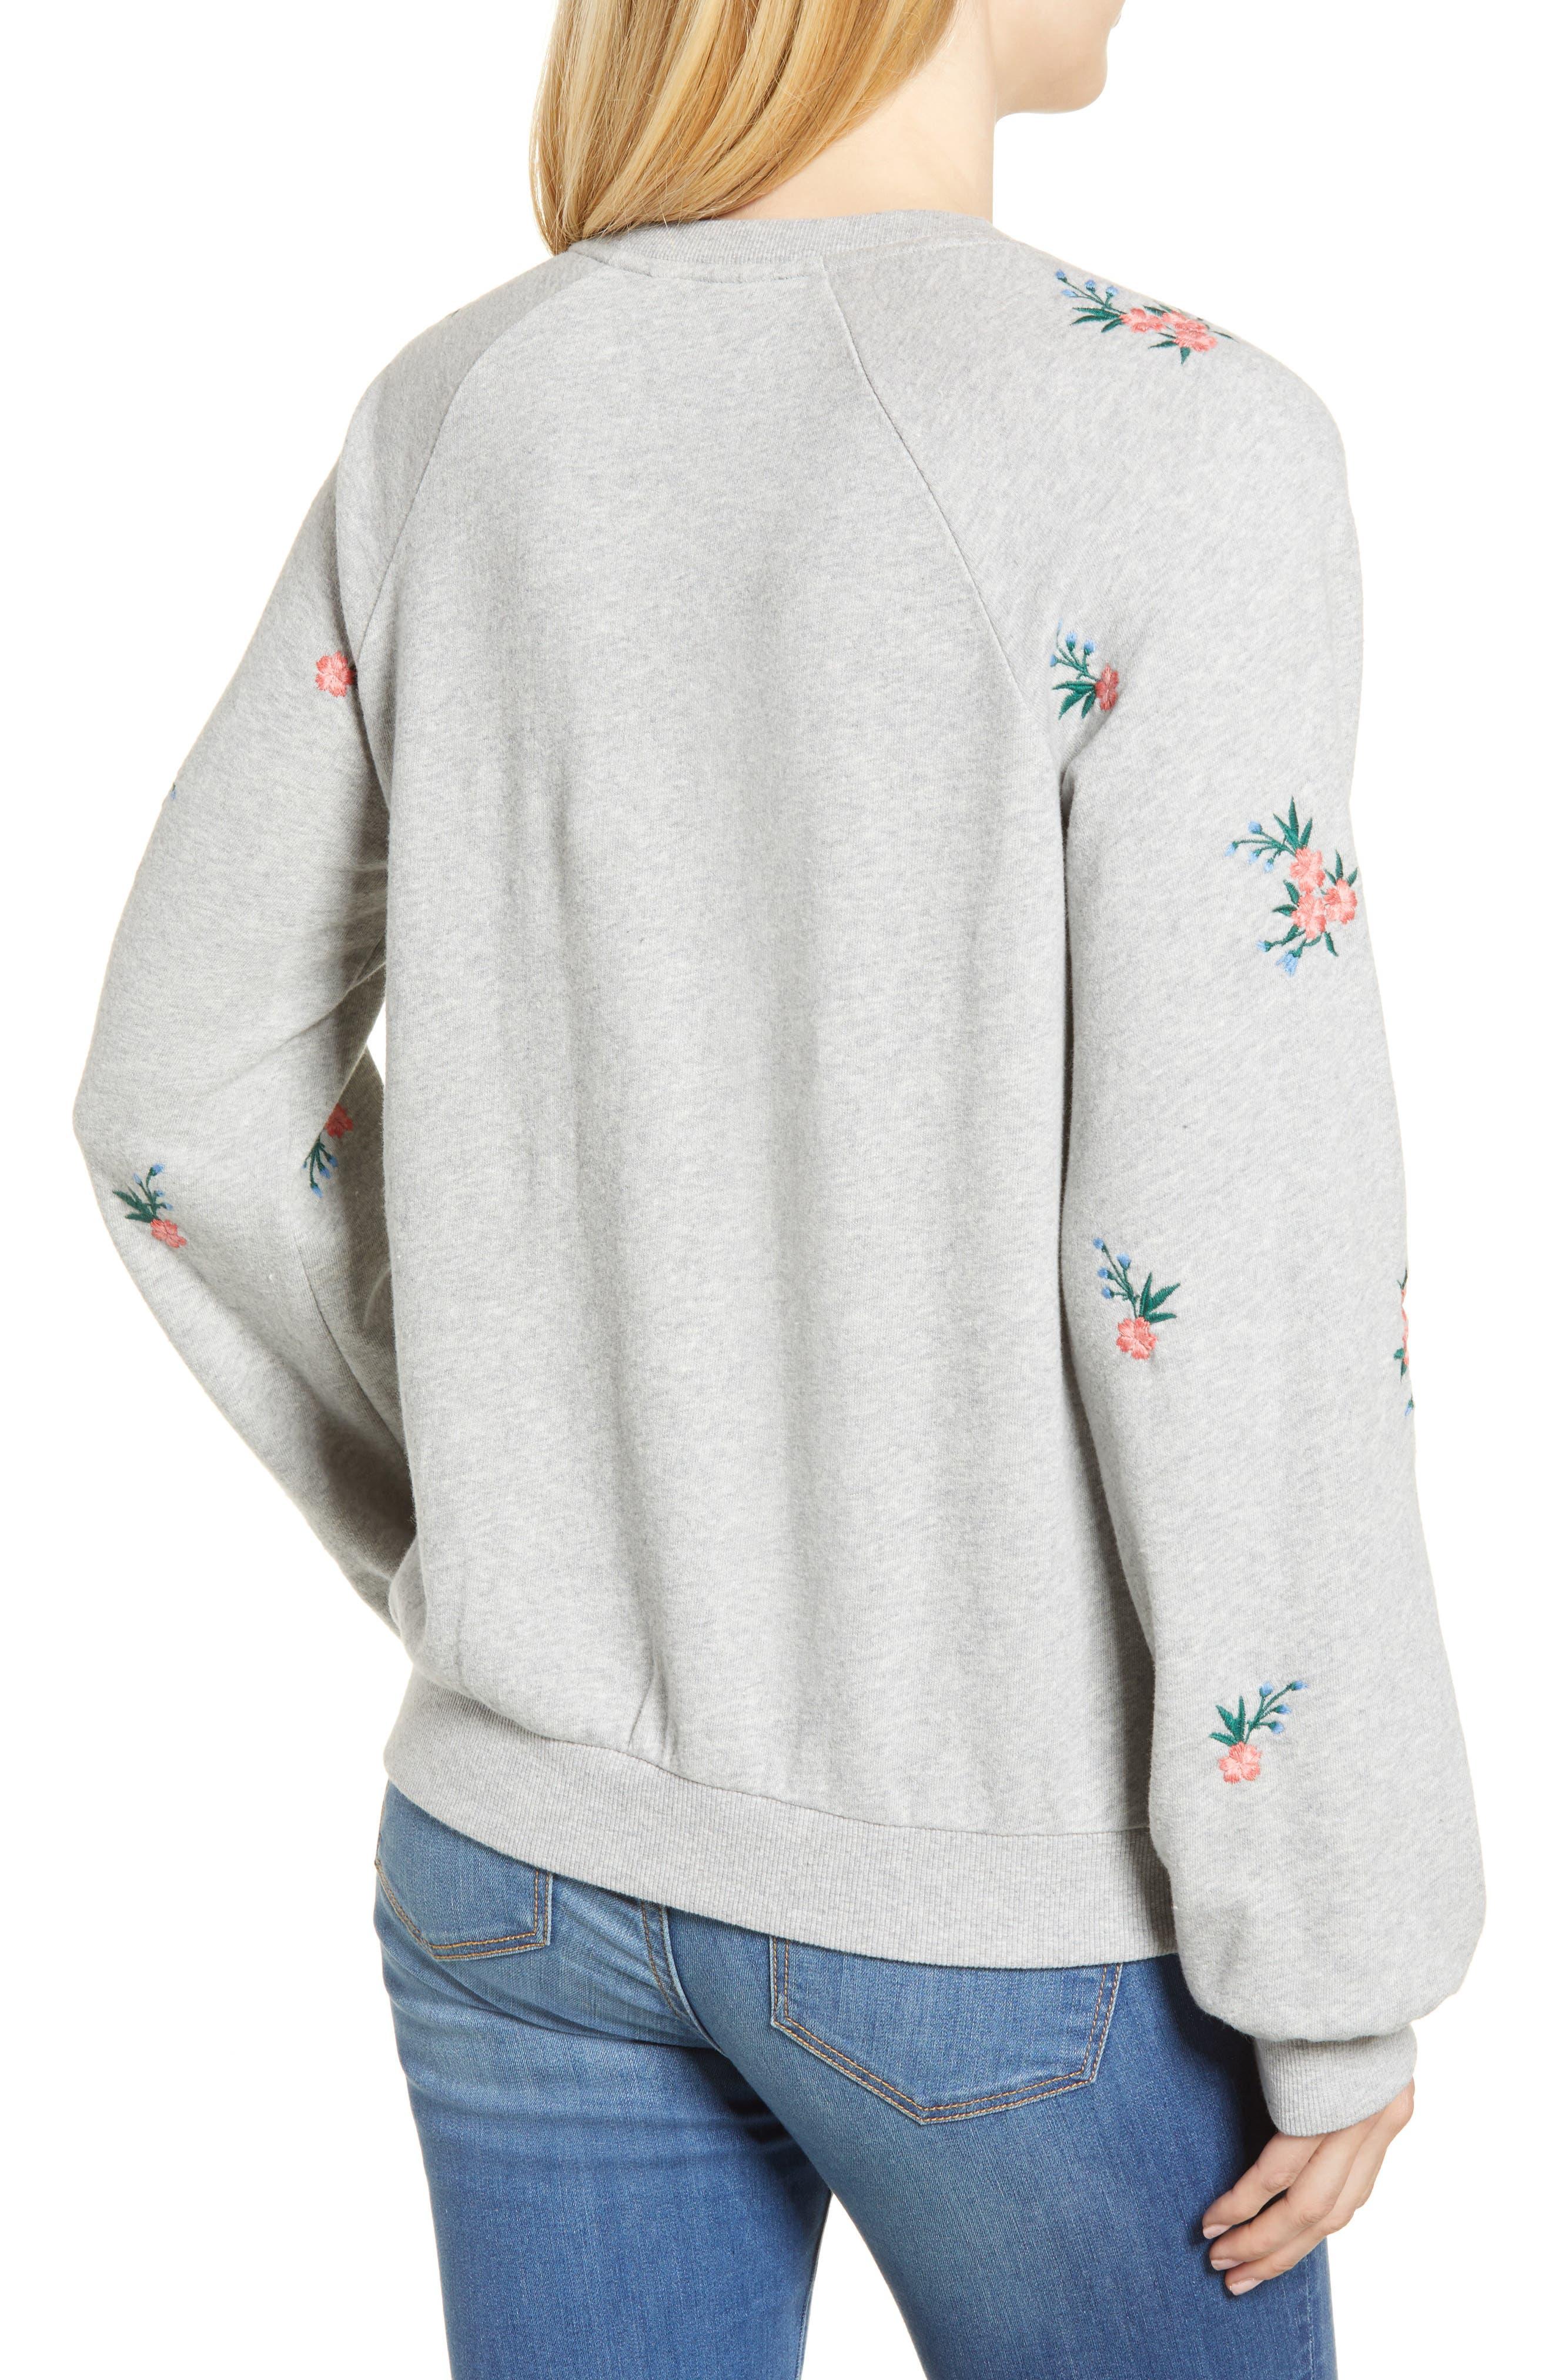 Embroidered Sweatshirt,                             Alternate thumbnail 2, color,                             030